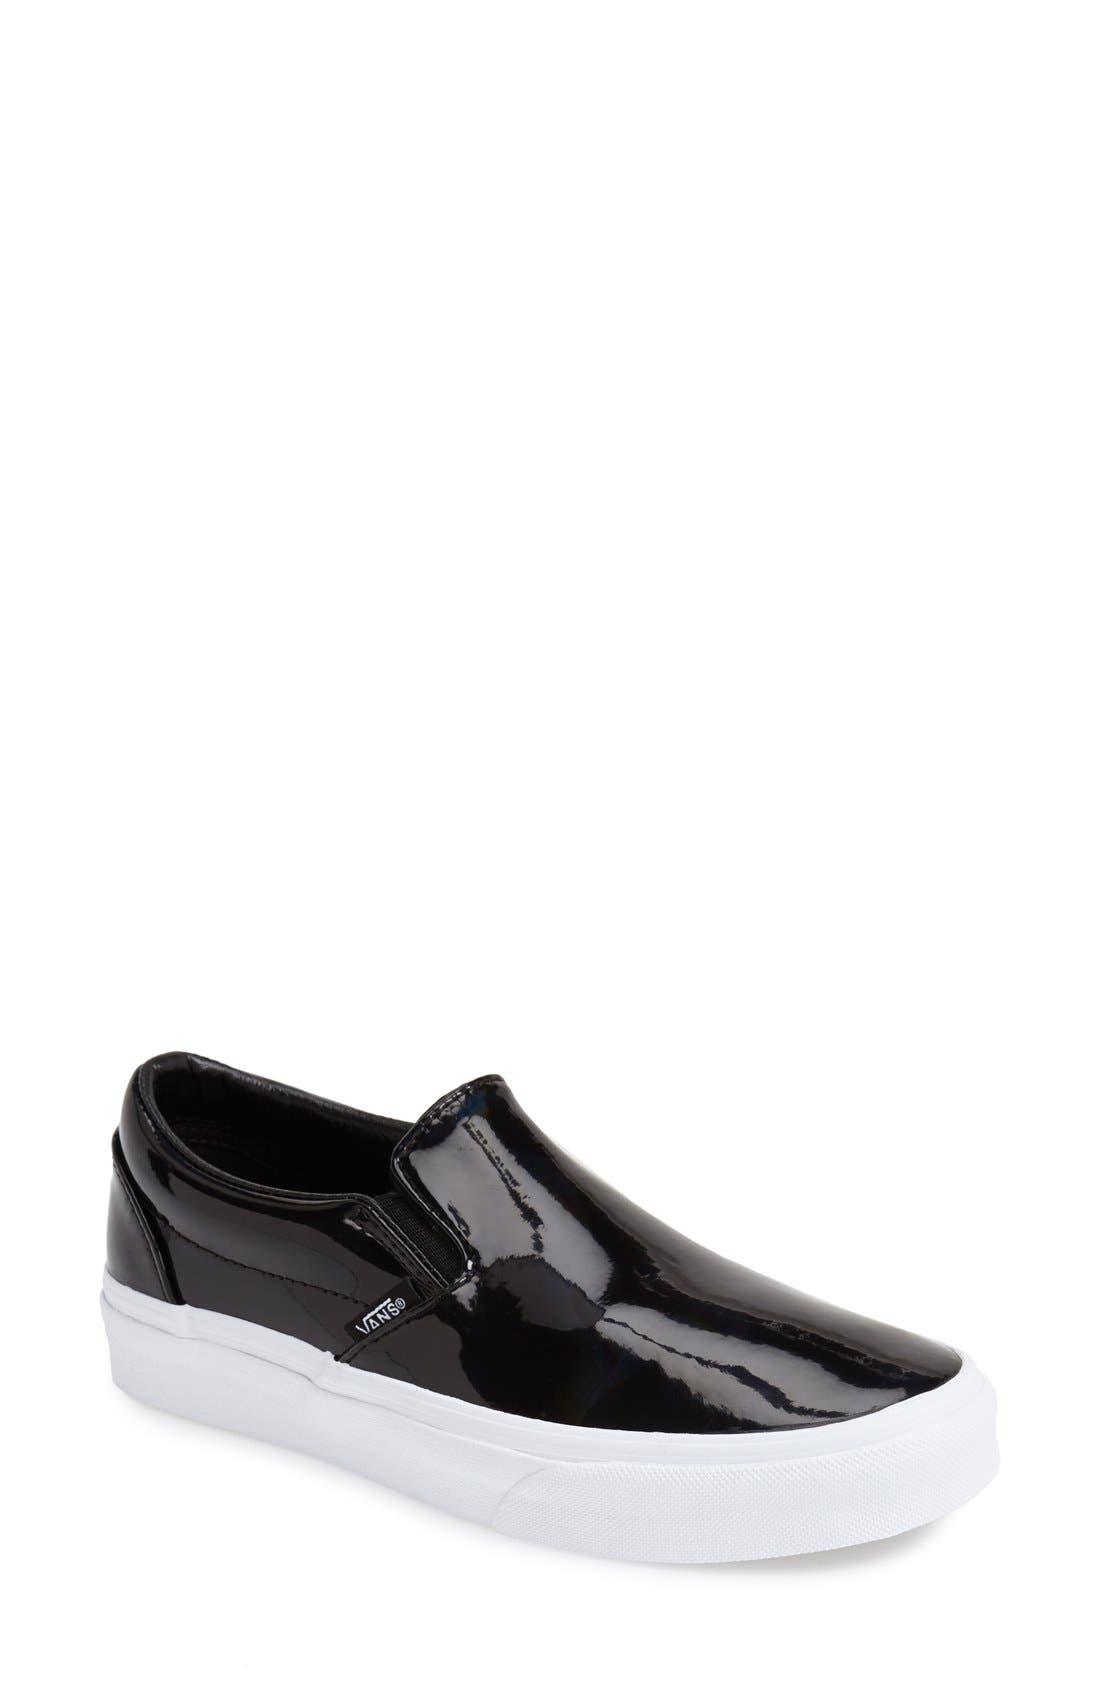 Main Image - Vans Patent Leather Slip-On Sneaker (Women)